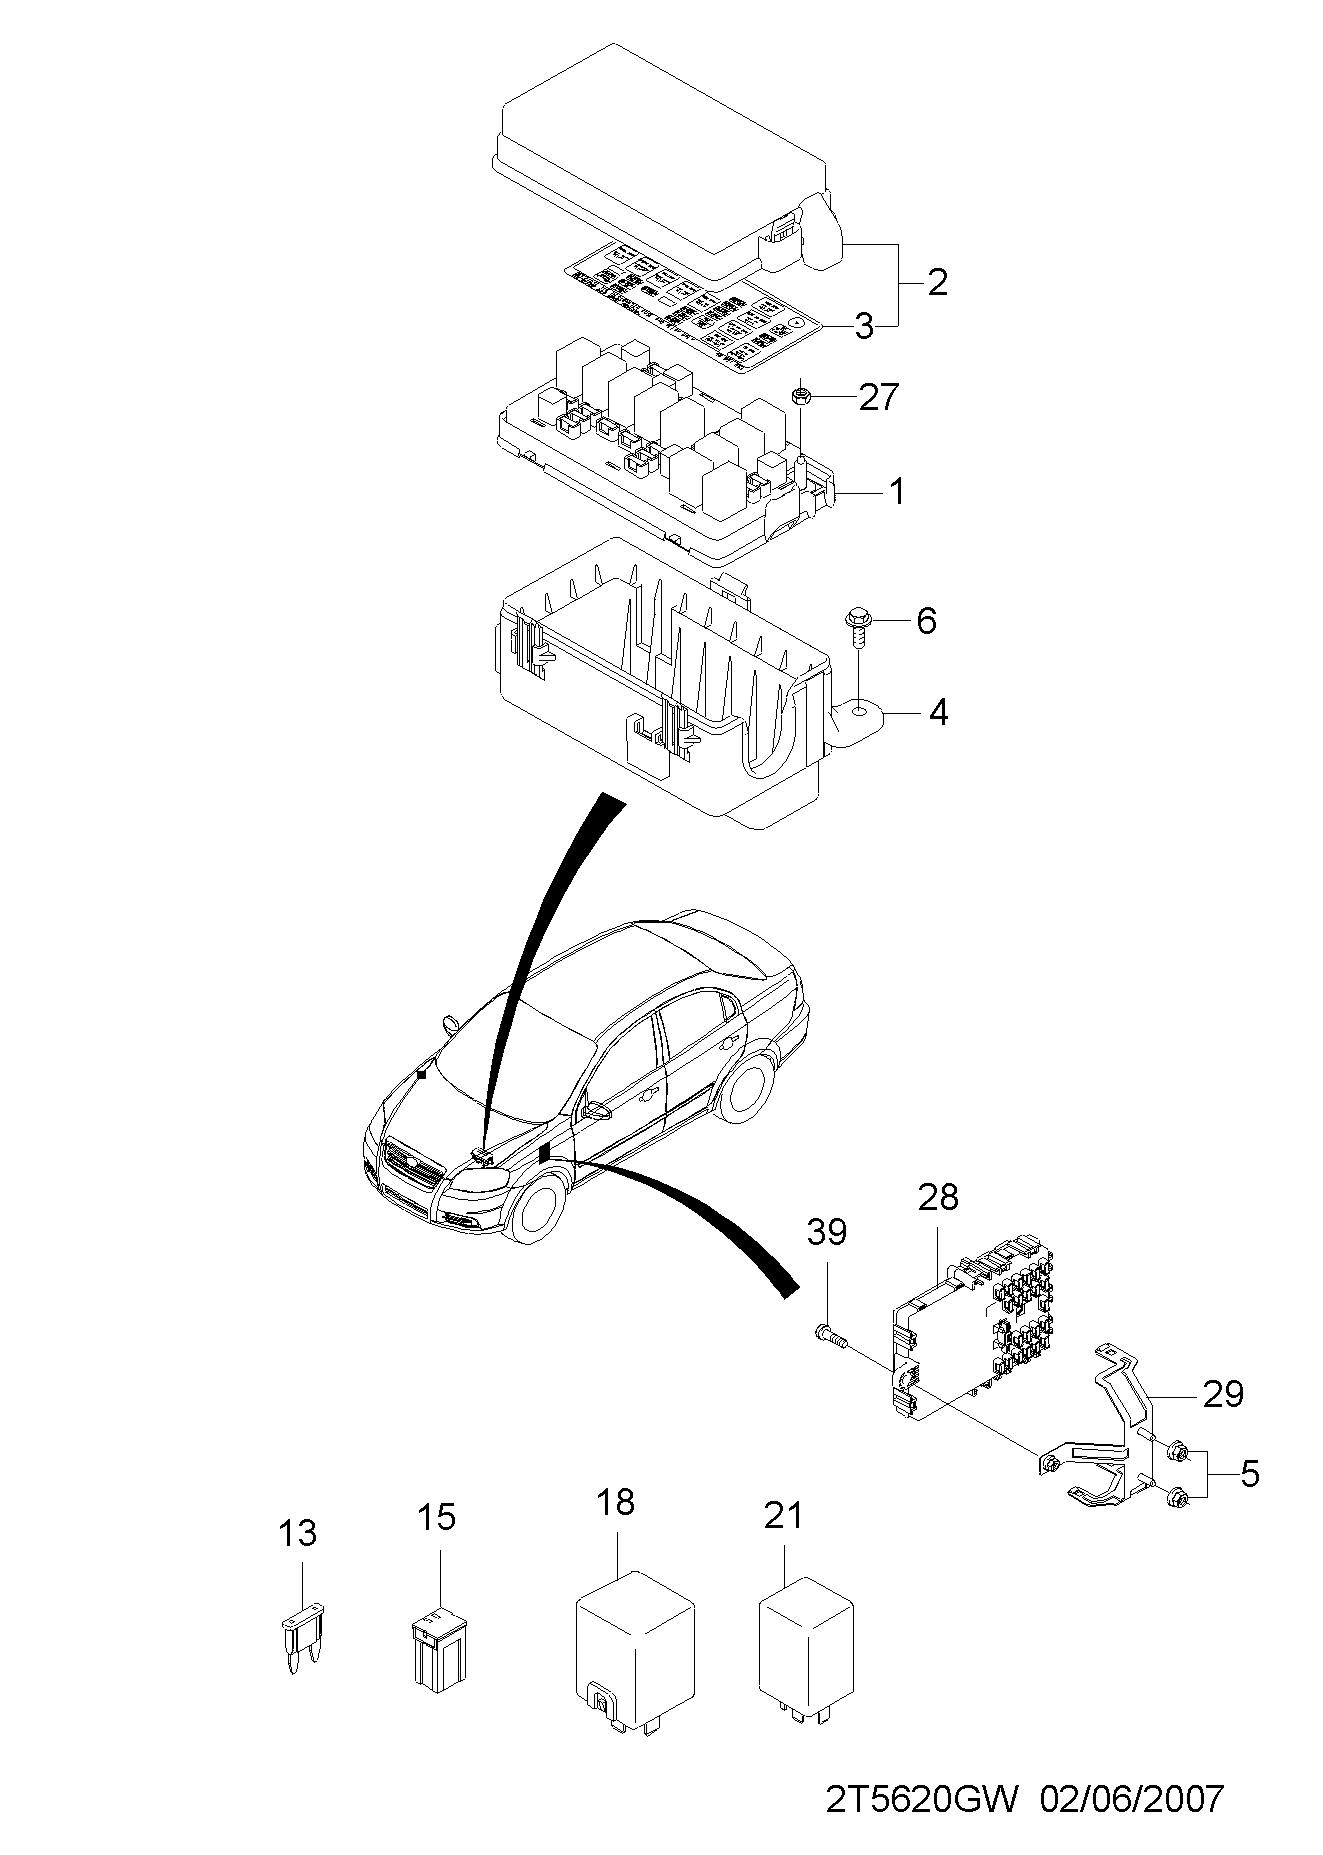 Fuse Box Login Auto Electrical Wiring Diagram Outside 1997 Jeep Wrangler Portal Map Elsalvadorla